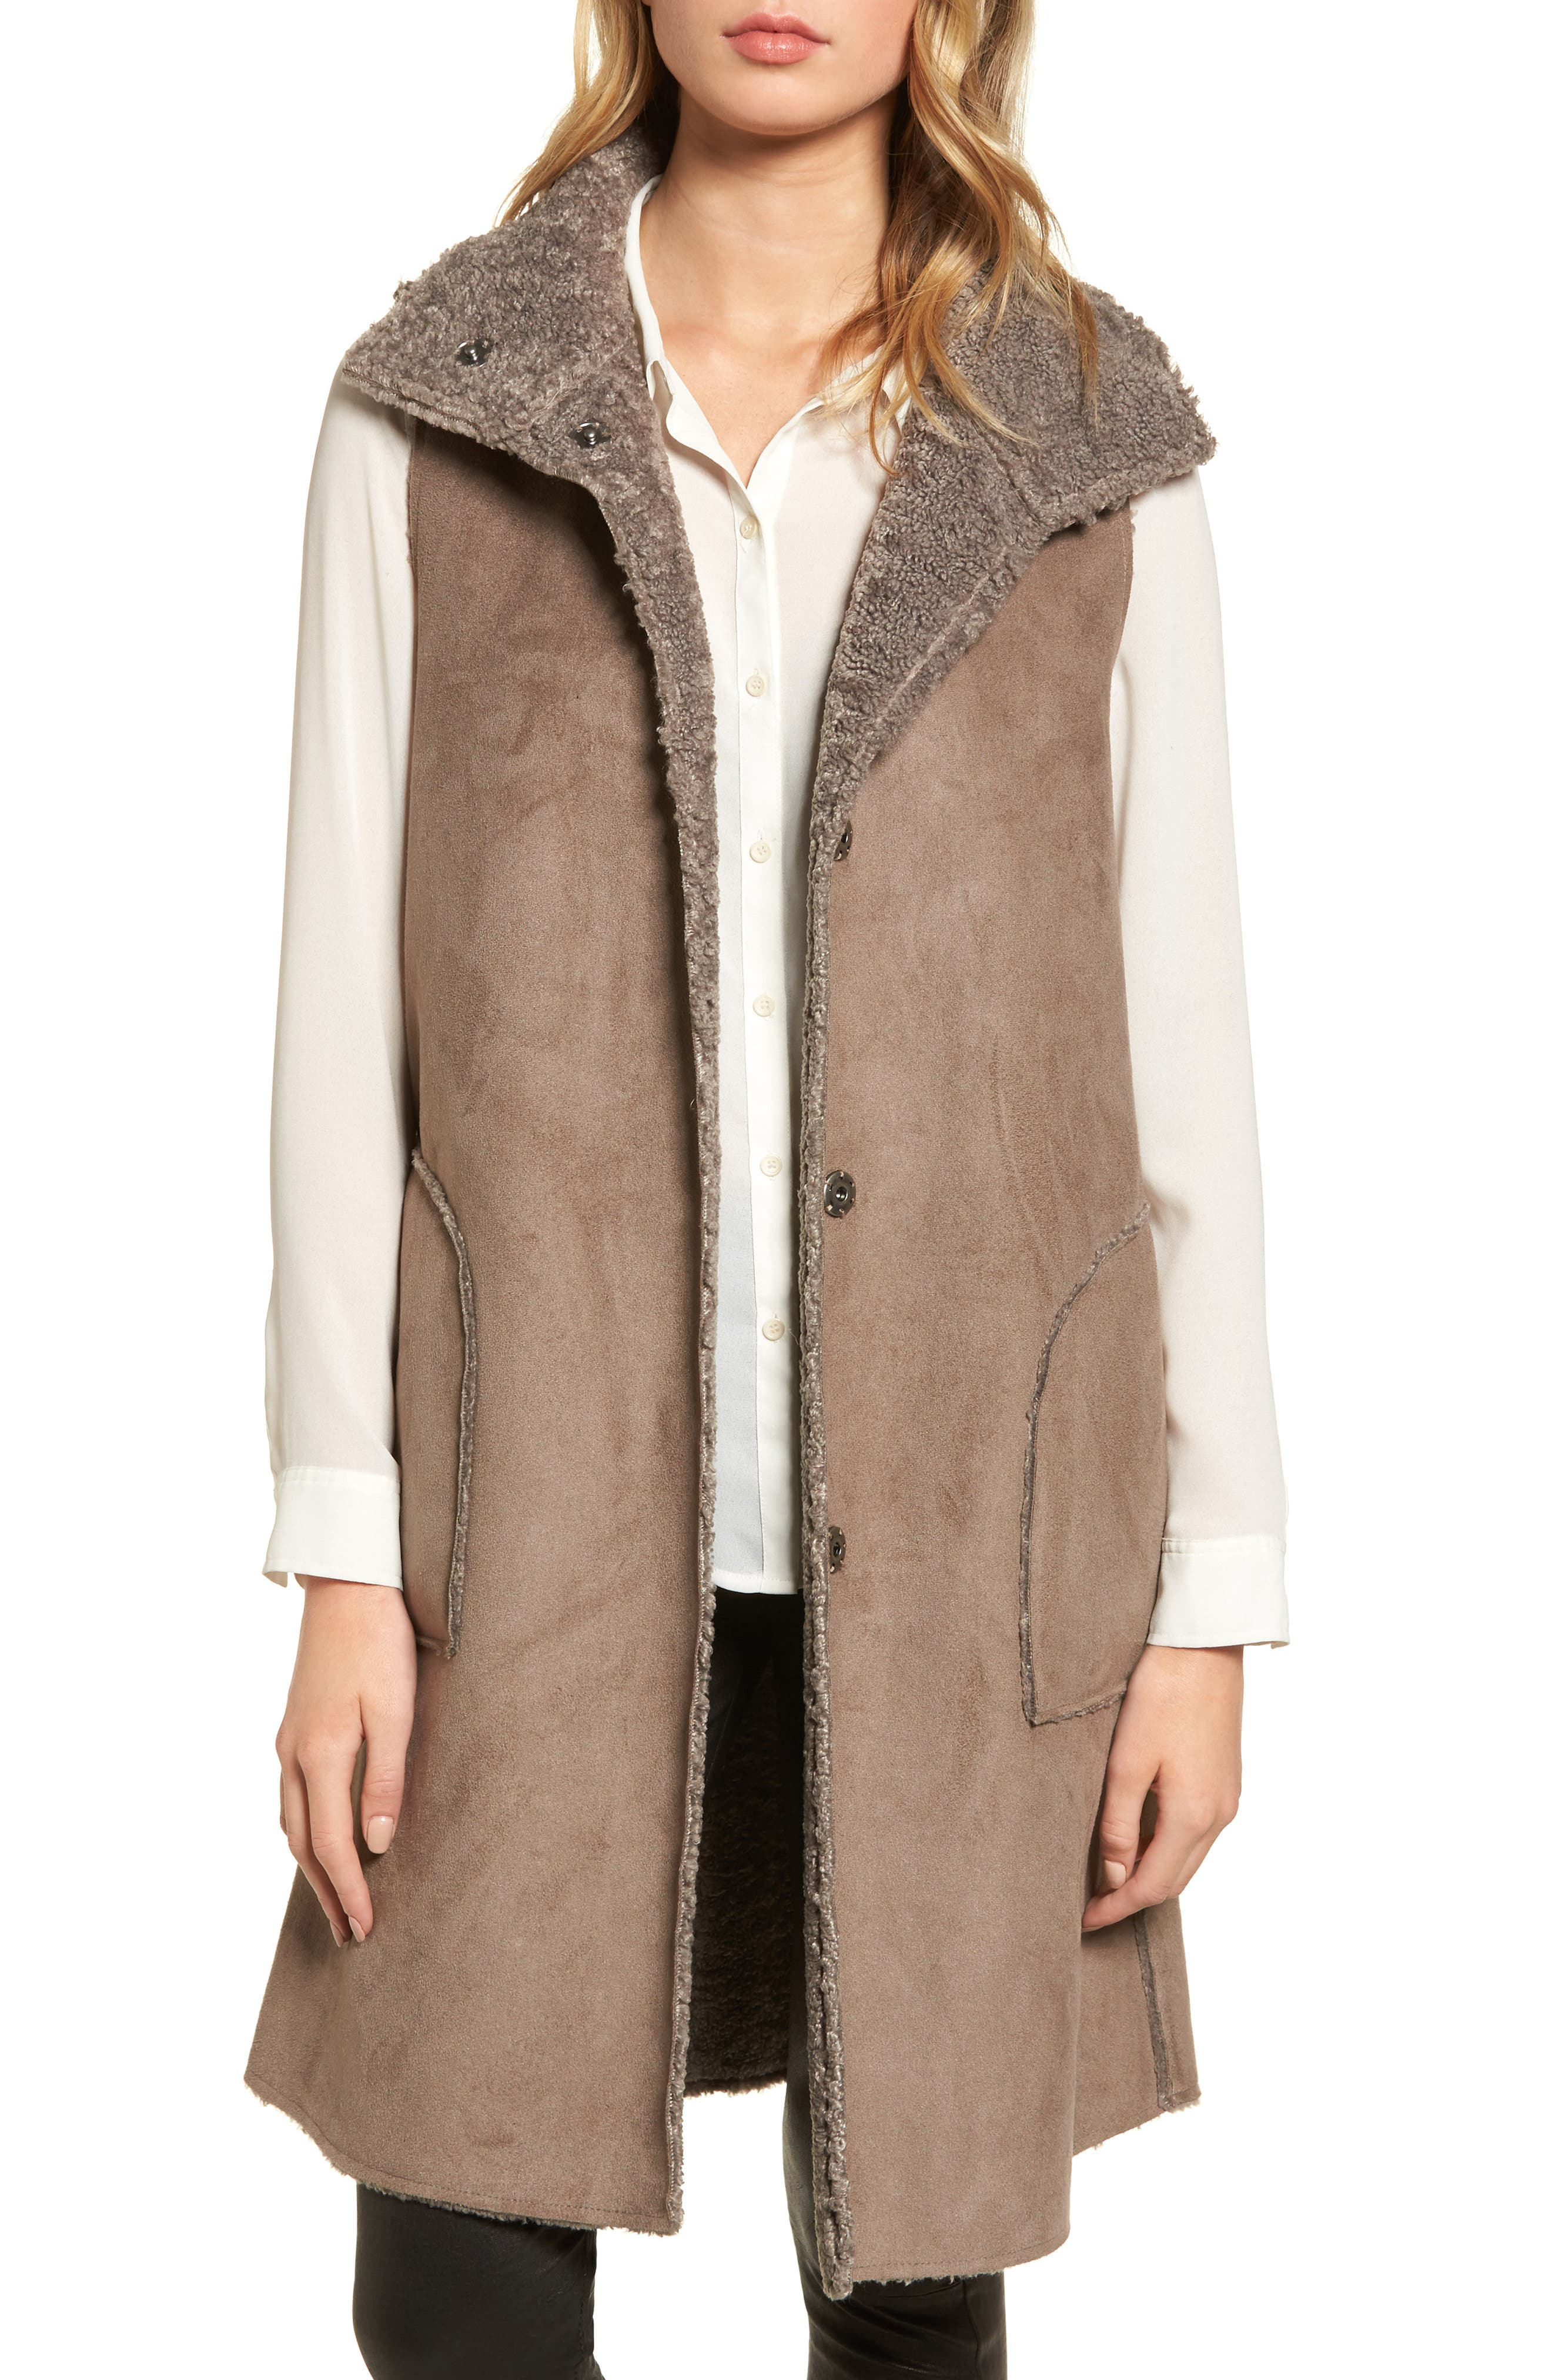 Velvet Reversible Faux Shearling Vest,                             Main thumbnail 1, color,                             Brown/ Brown